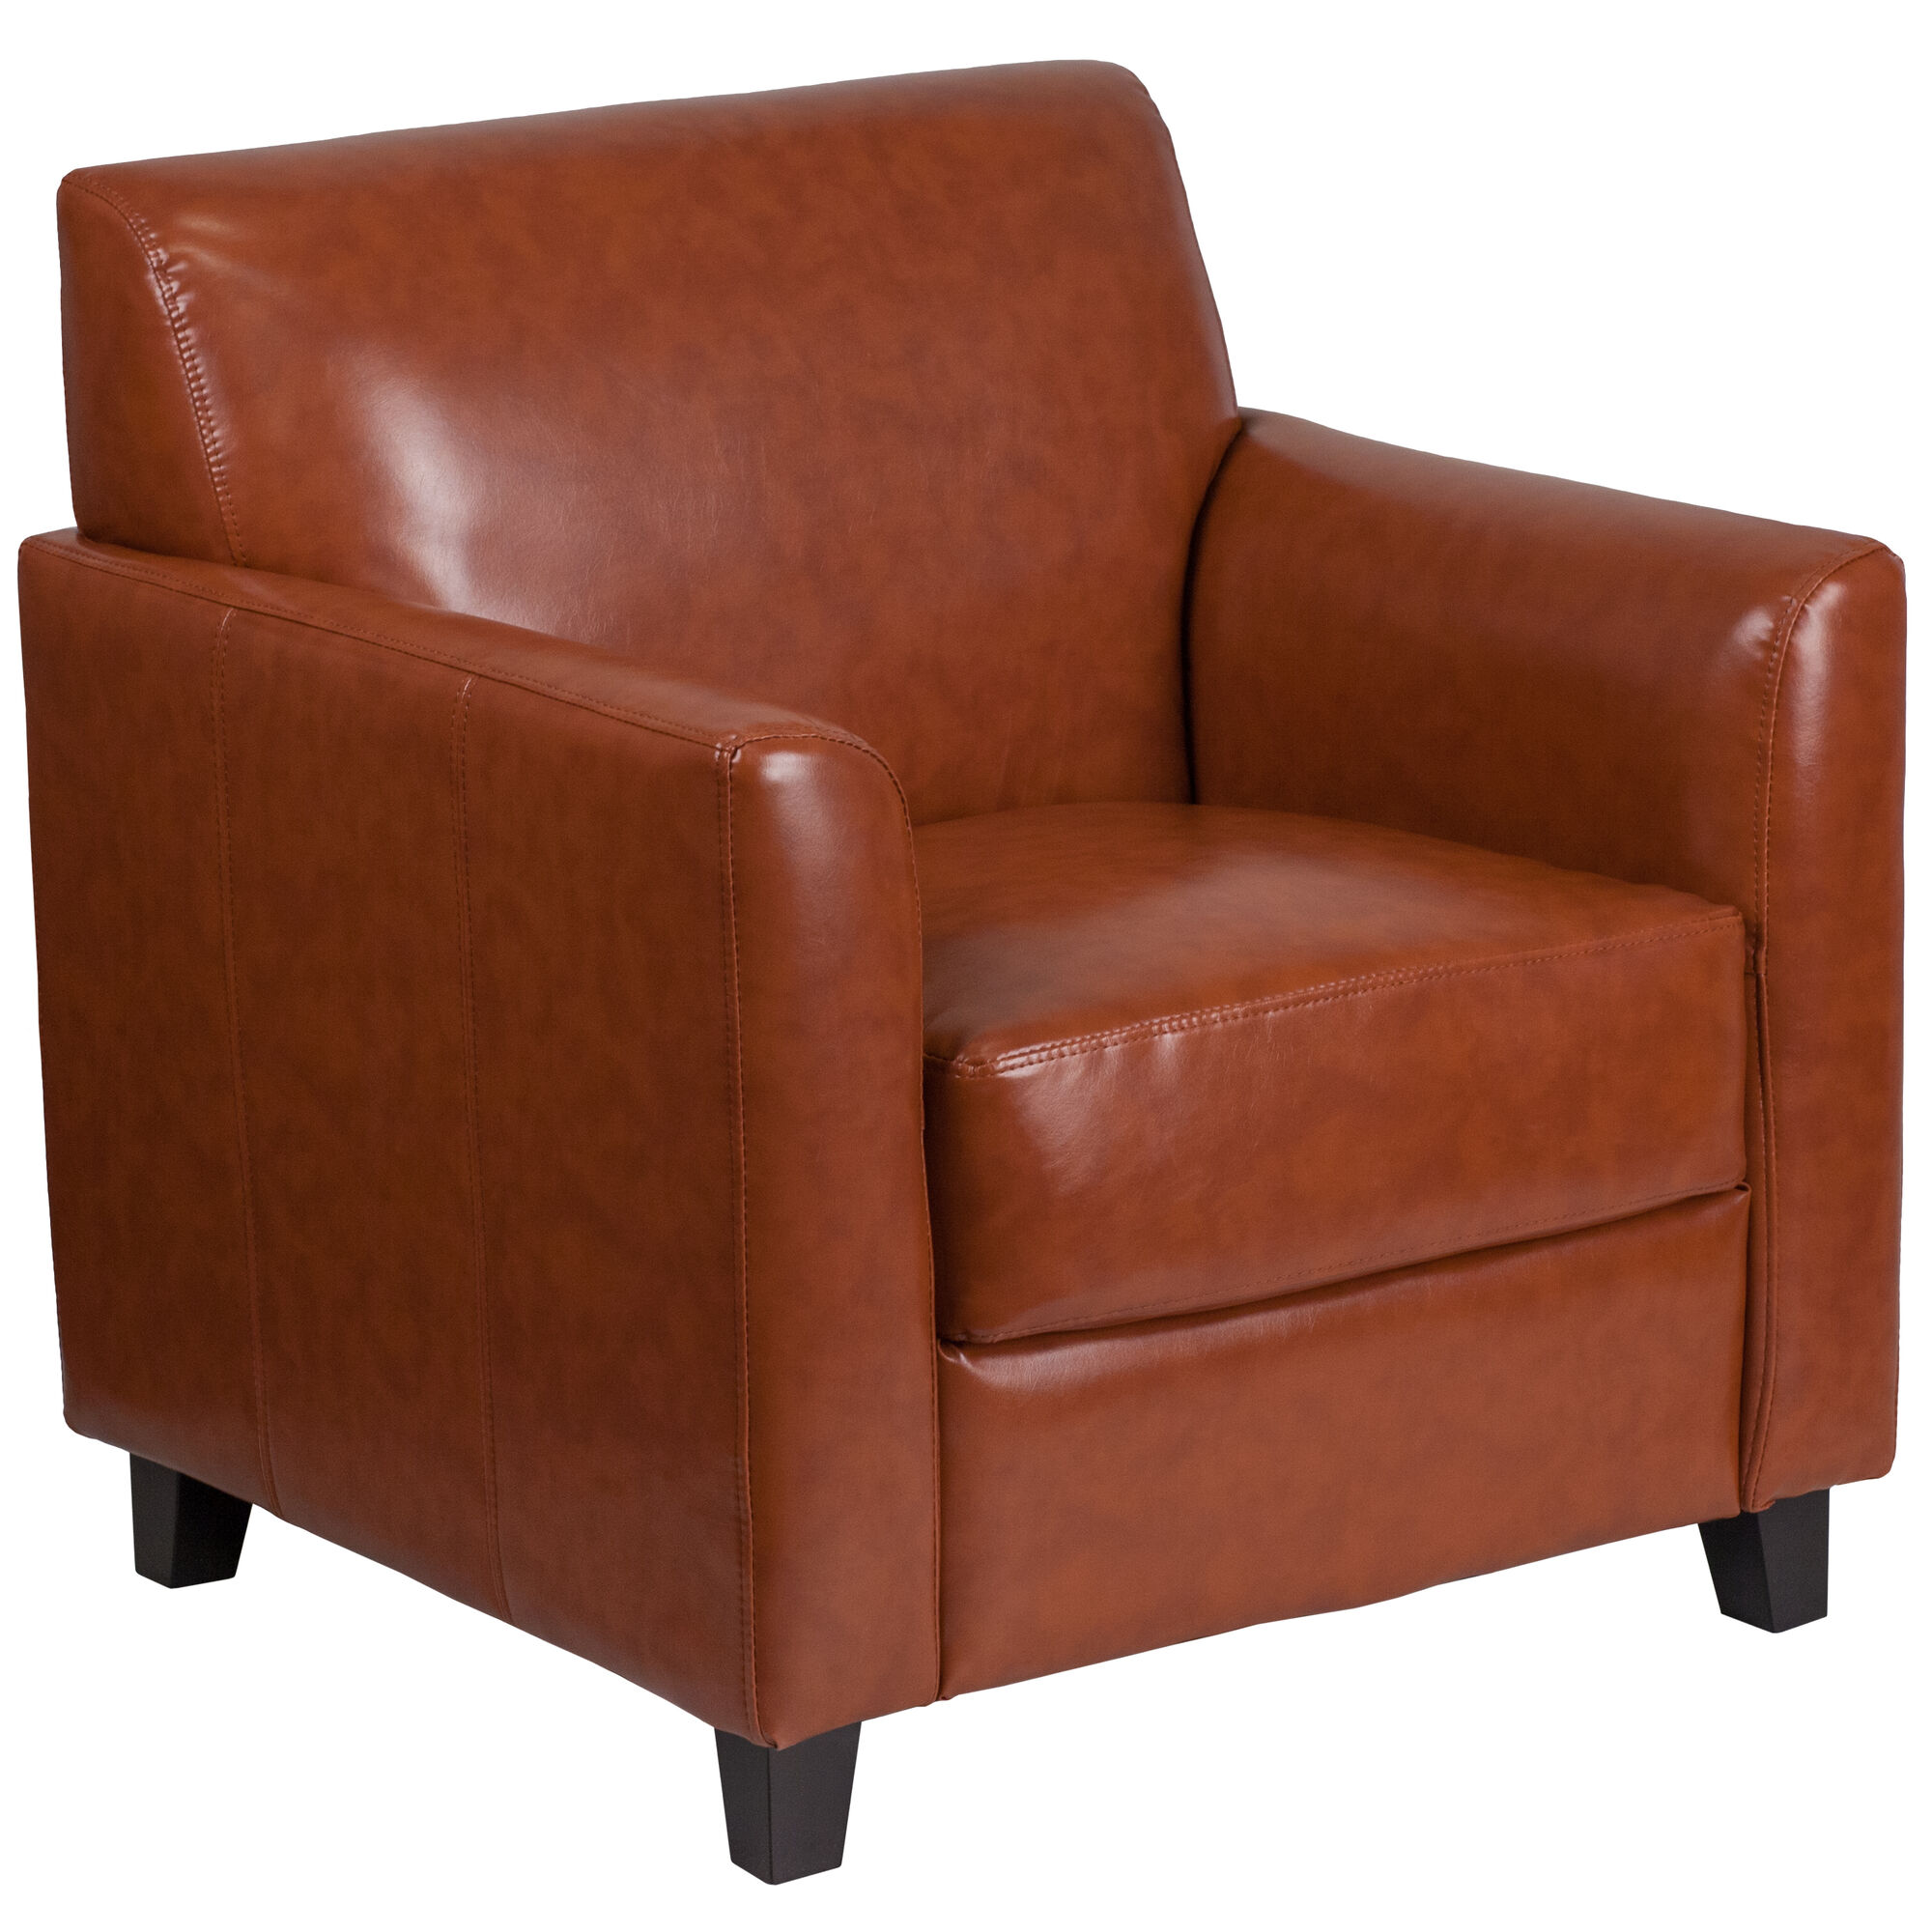 Outstanding Hercules Diplomat Series Cognac Leather Chair Creativecarmelina Interior Chair Design Creativecarmelinacom